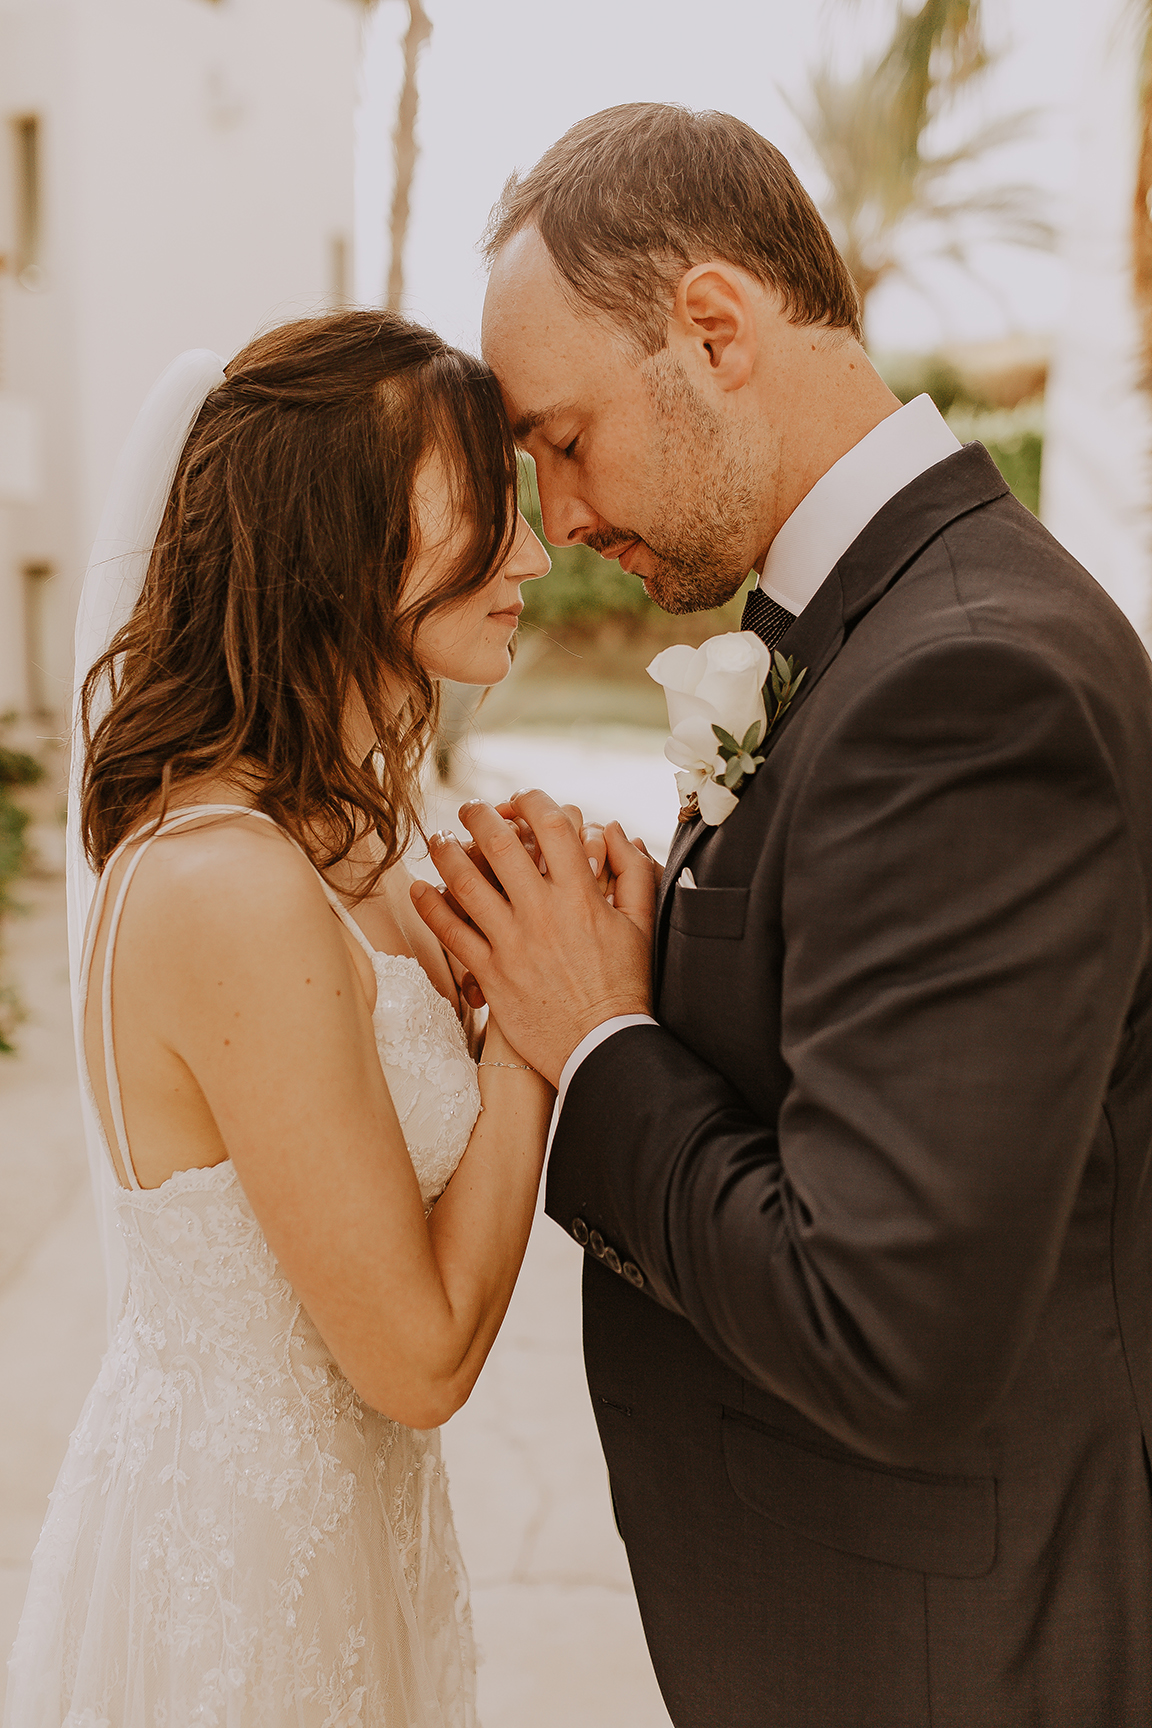 Lindsei+James_cabo_wedding_447.jpg